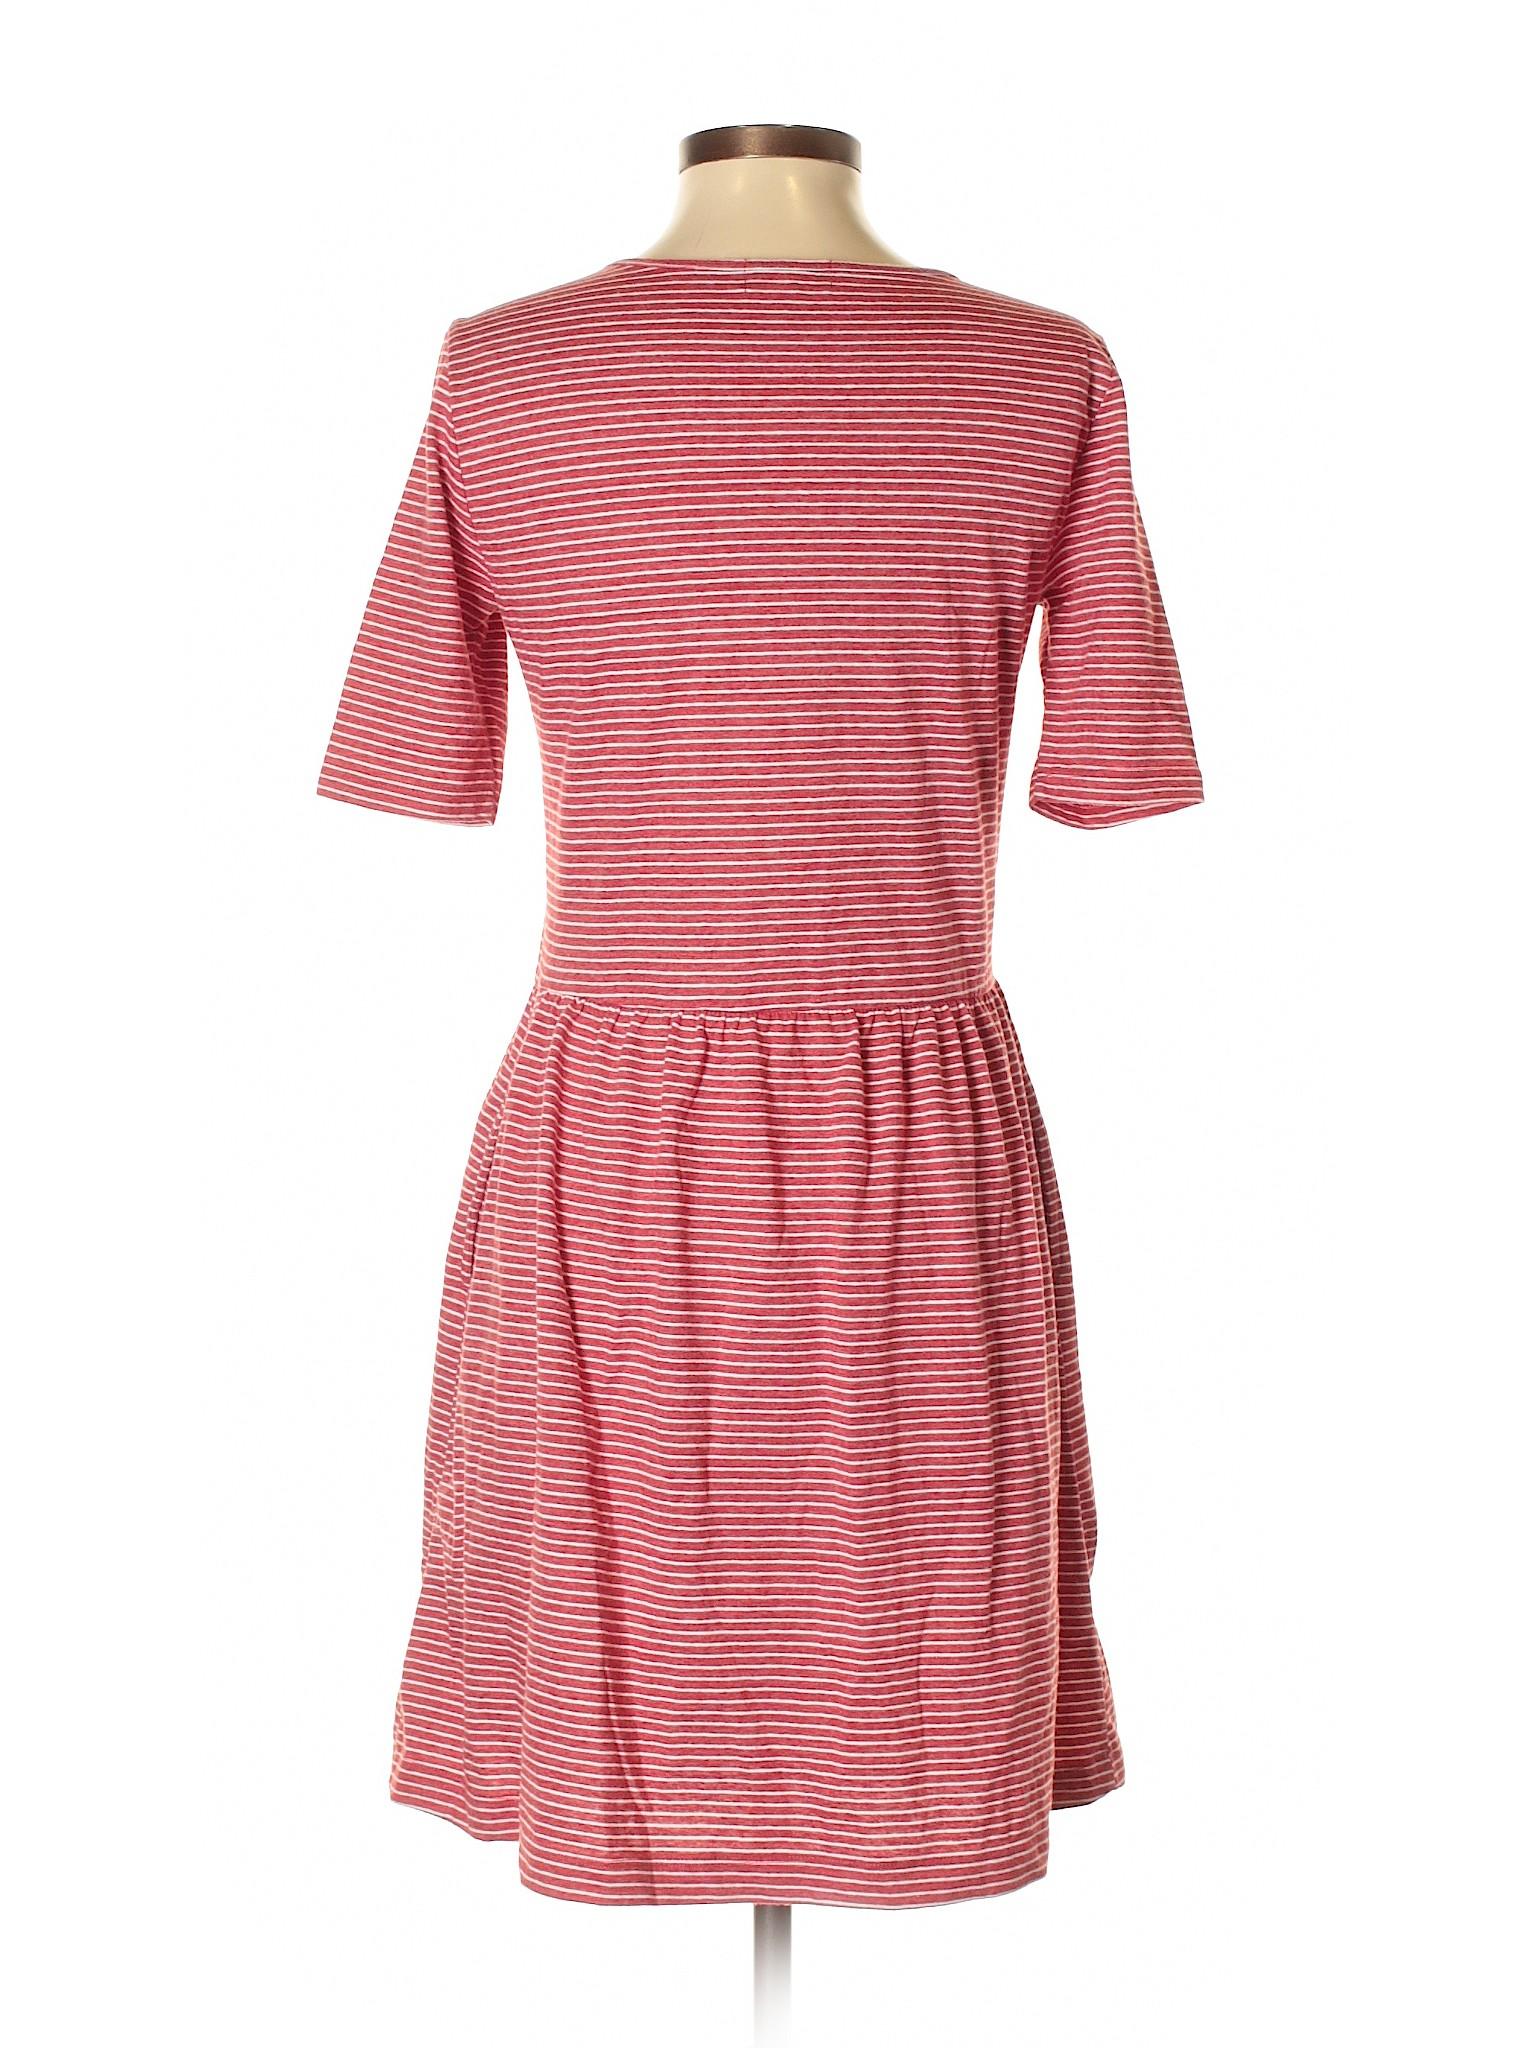 Casual Gap Selling Dress Selling Gap zwRwPvtq